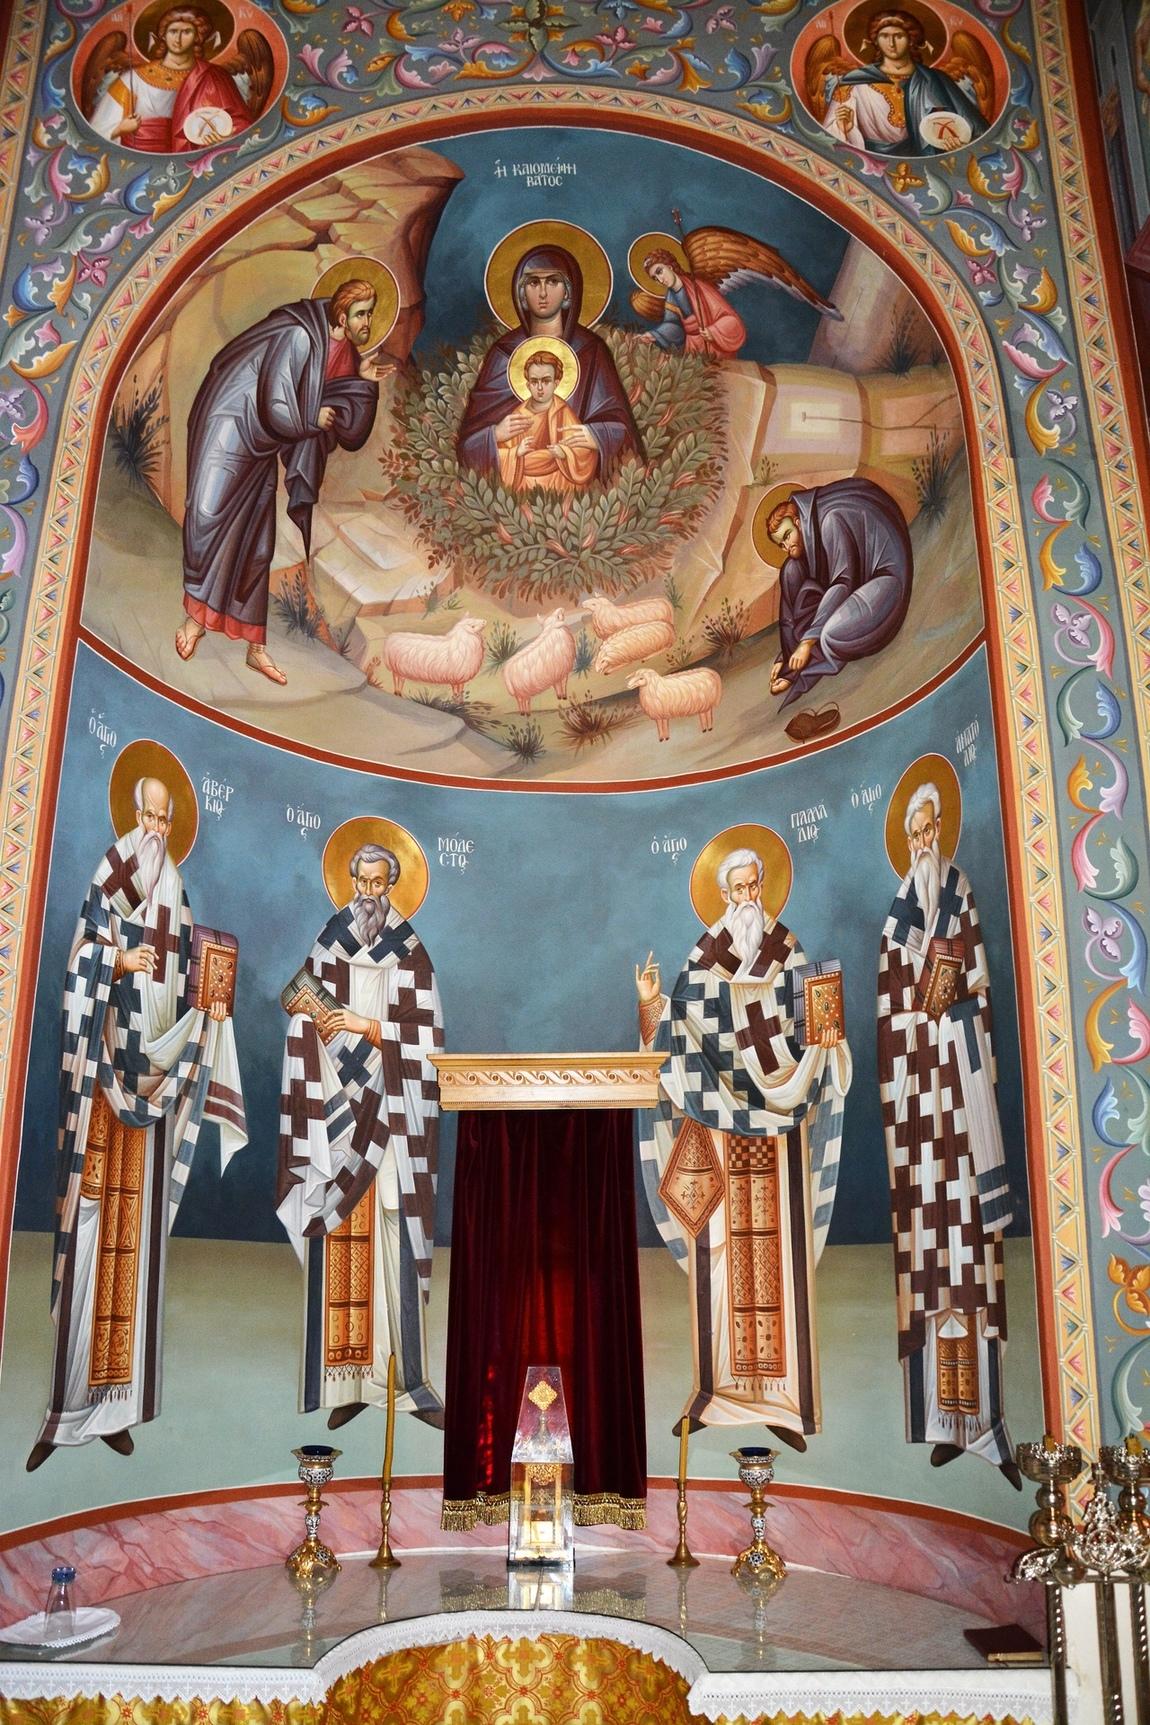 Themis Petrou - Holy Trinity's Church (Glifada, Greece)